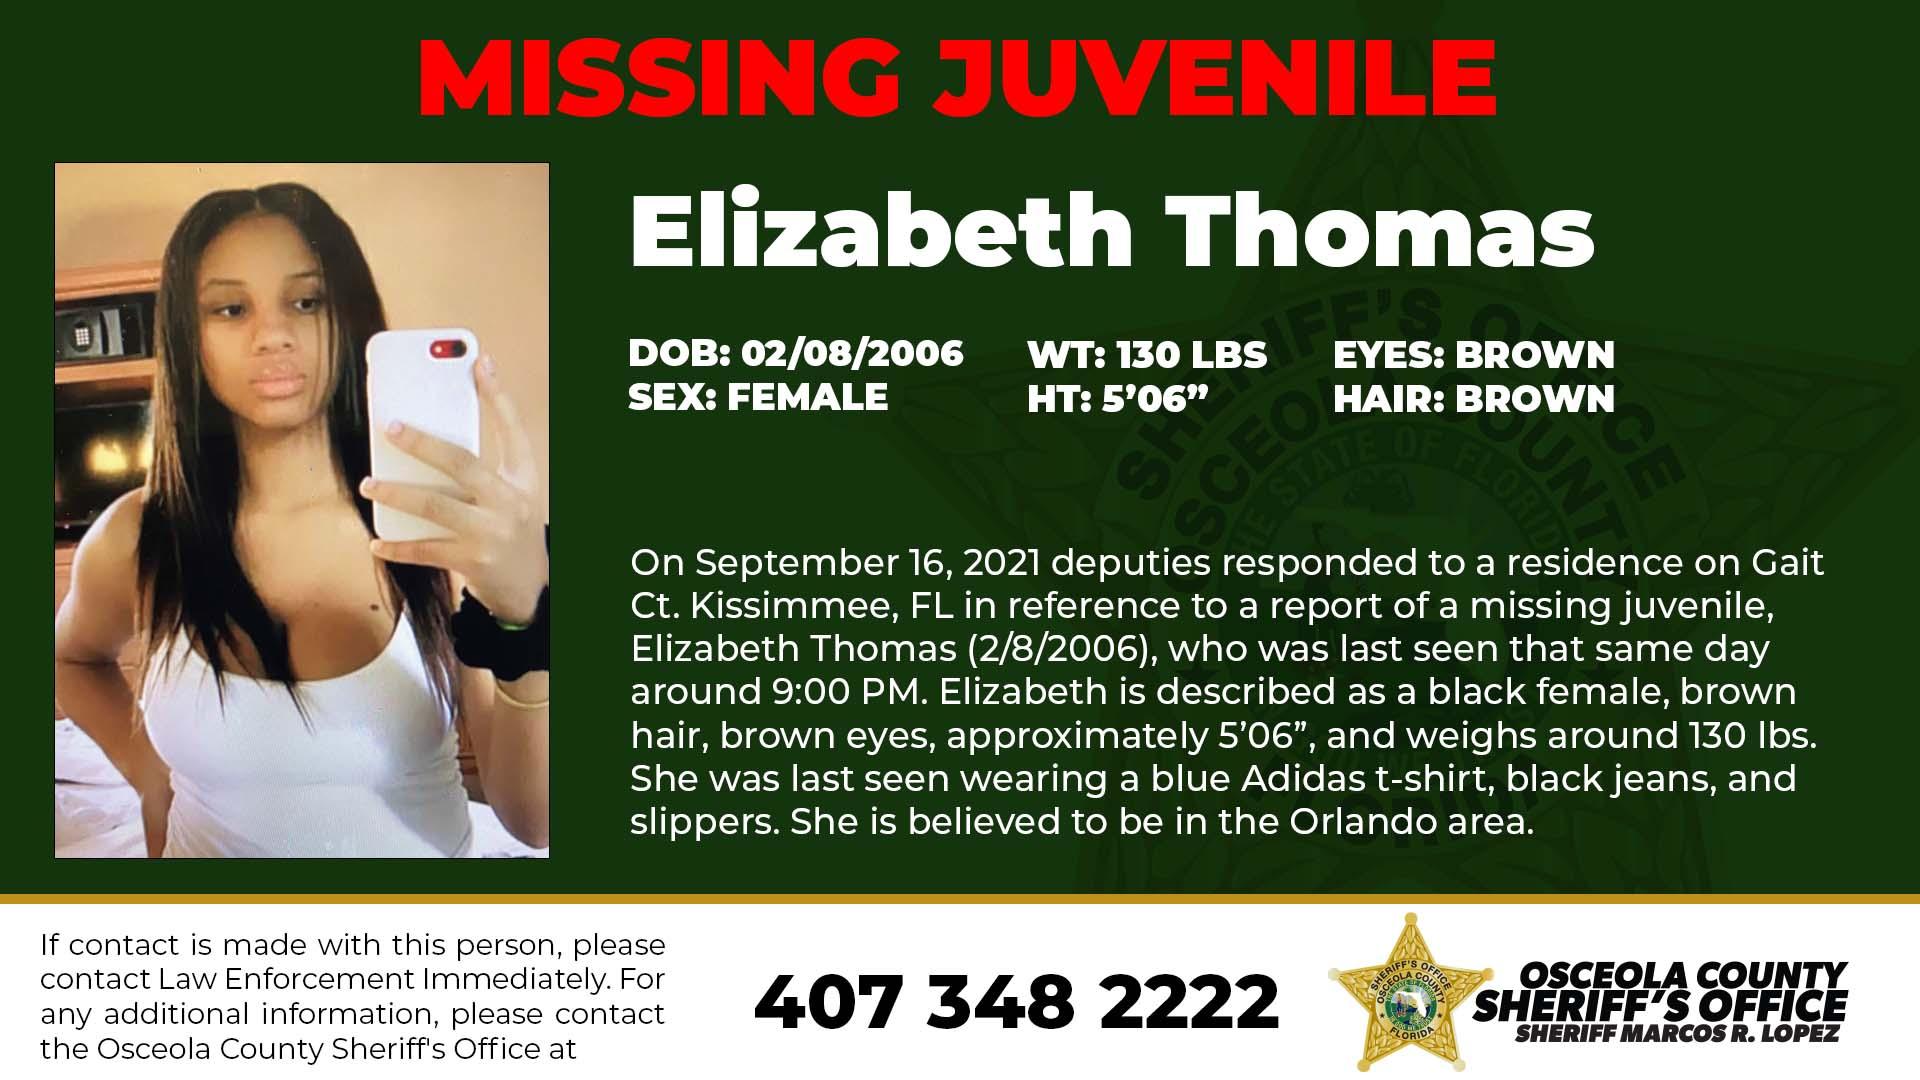 Missing person Elizabeth Thomas